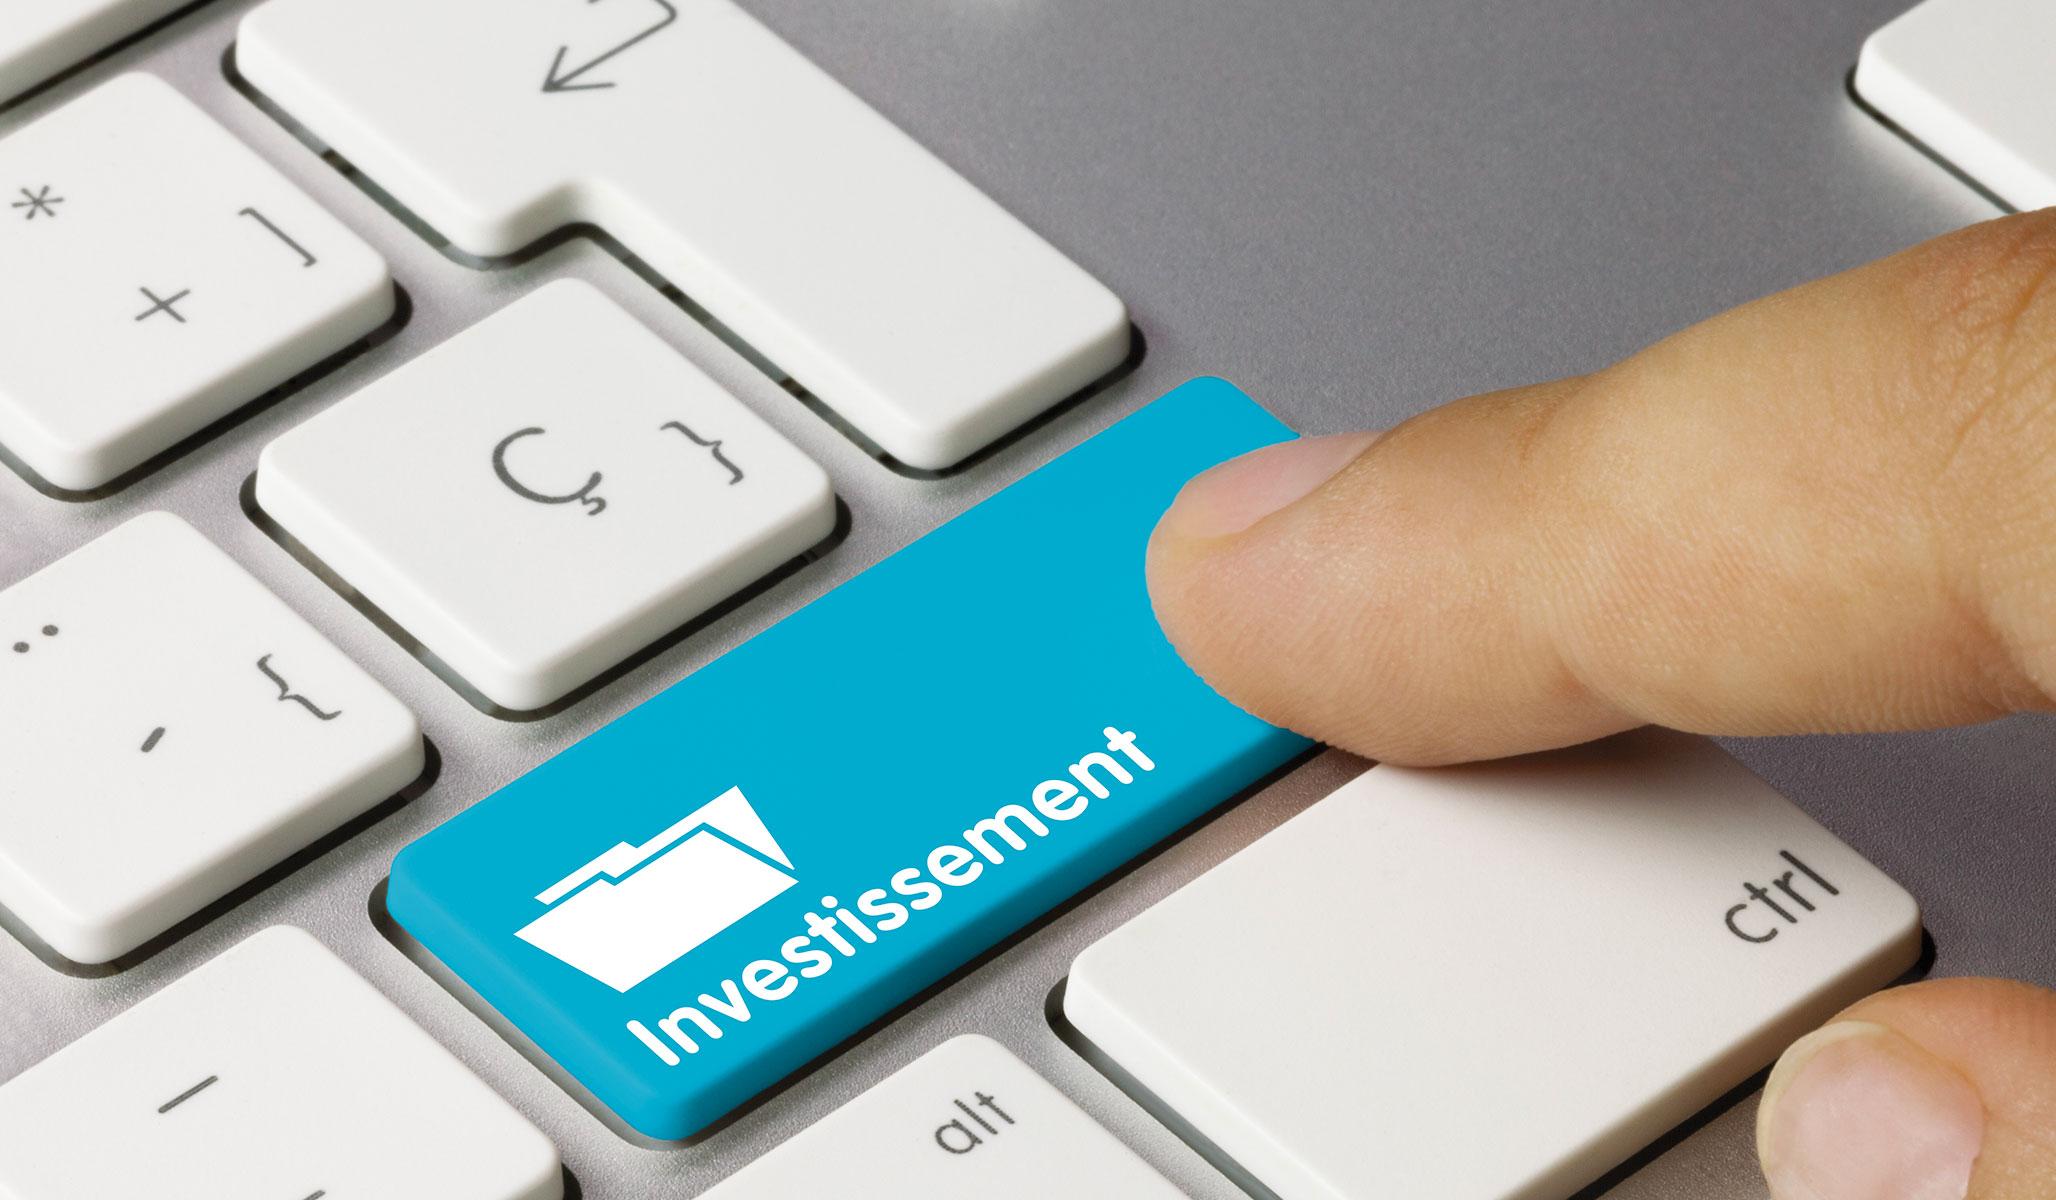 Investissement : pourquoi investir dans l'immobilier ?